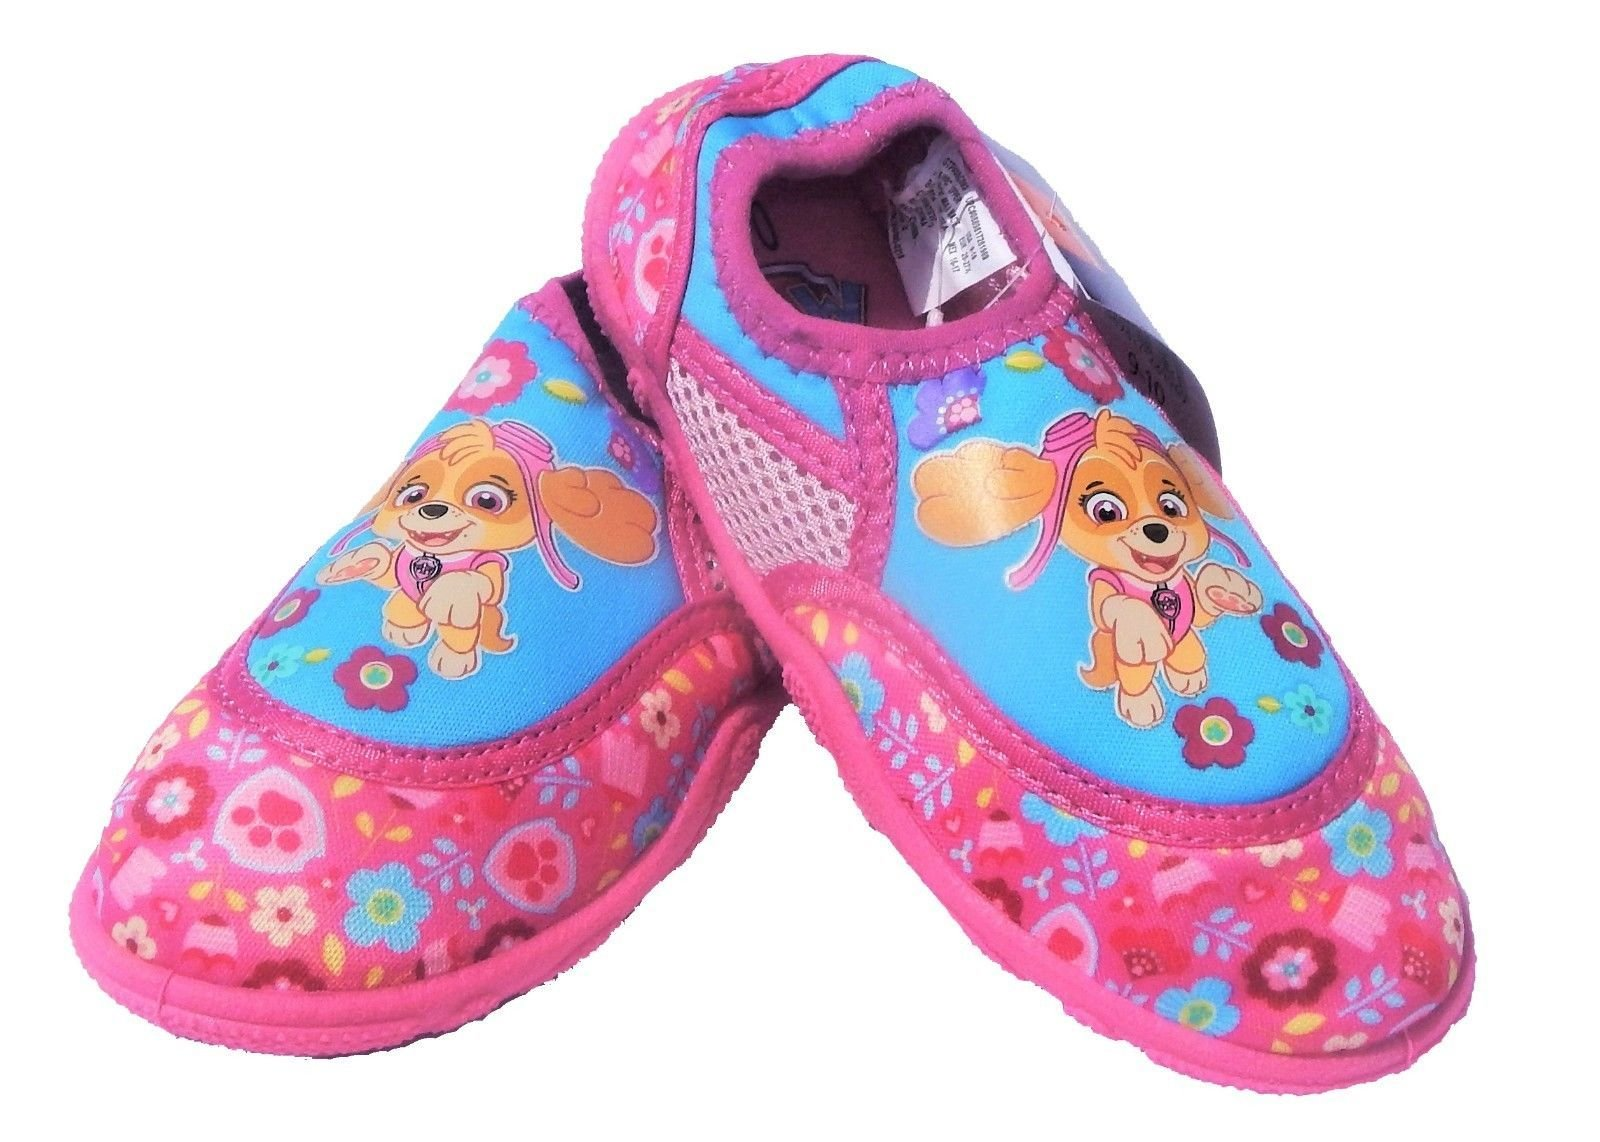 Nickelodeon Paw Patrol Skye Water Swim Shoes (9-10)